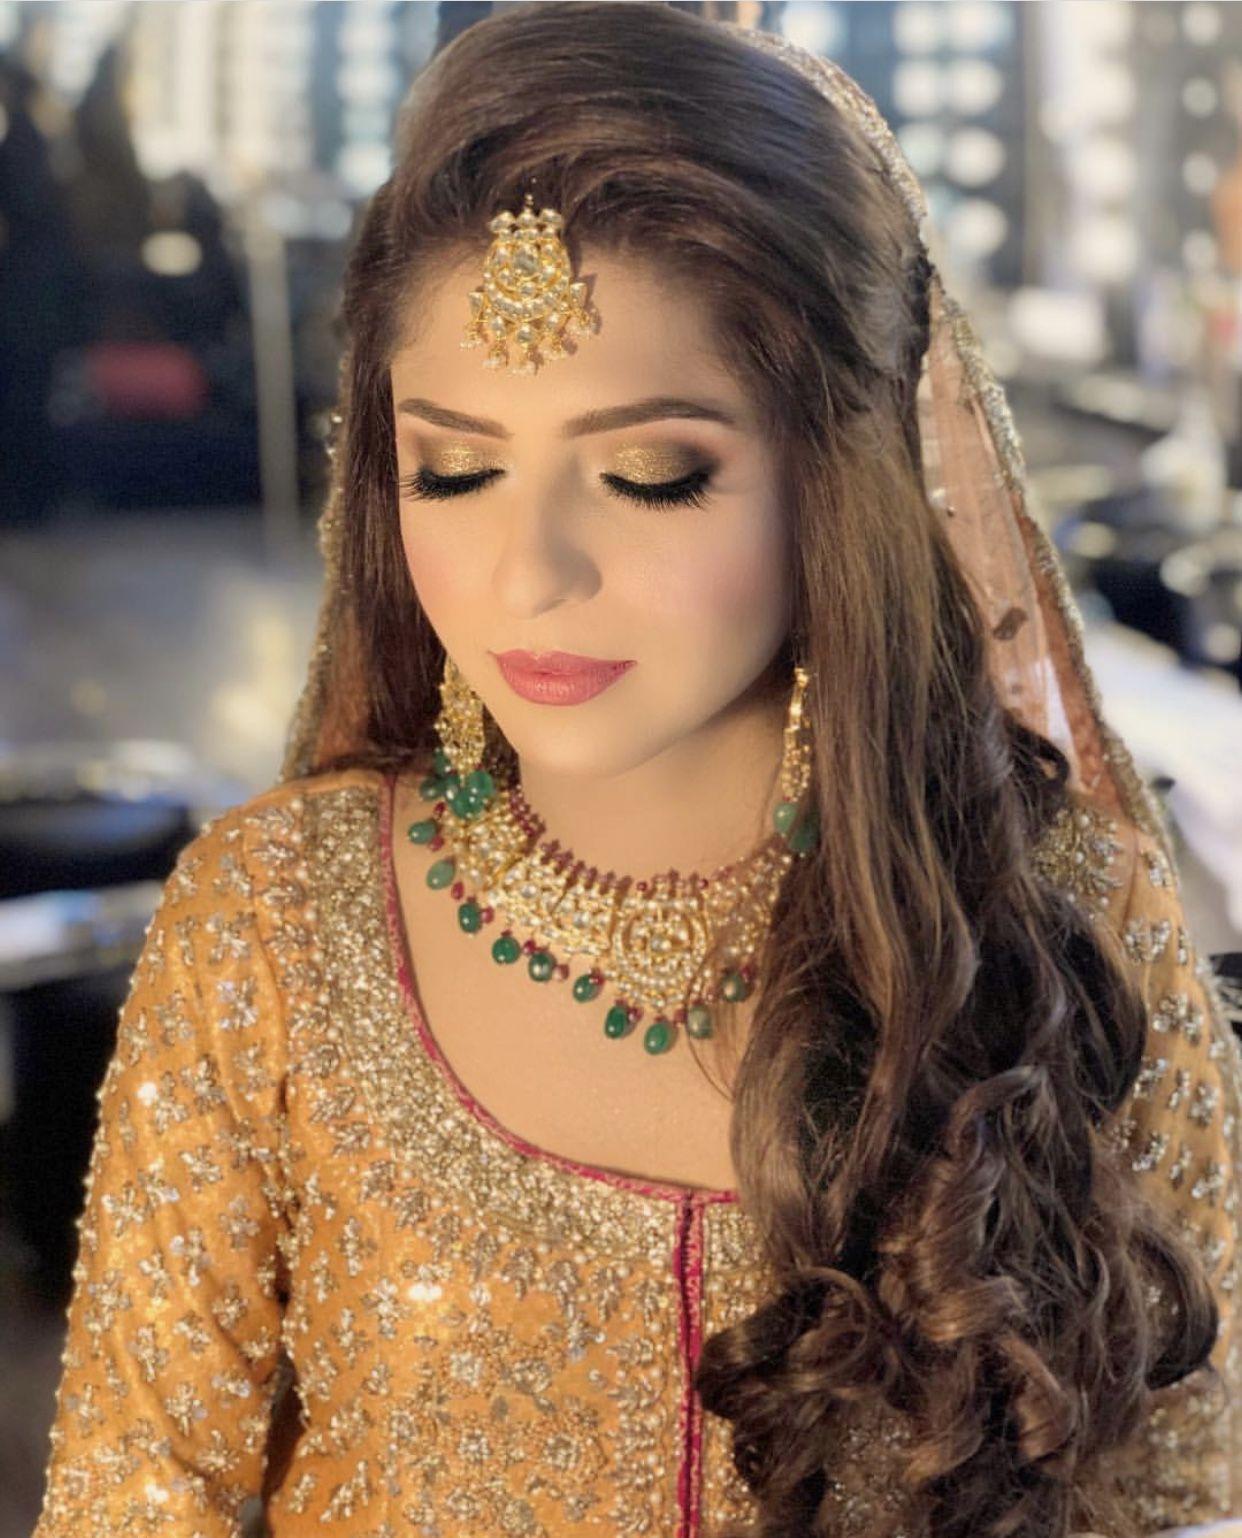 Mayun Mehndi Hairstyle Inspo For Brjde Mehndi Hairstyles Indian Hairstyles Bridal Hairdo